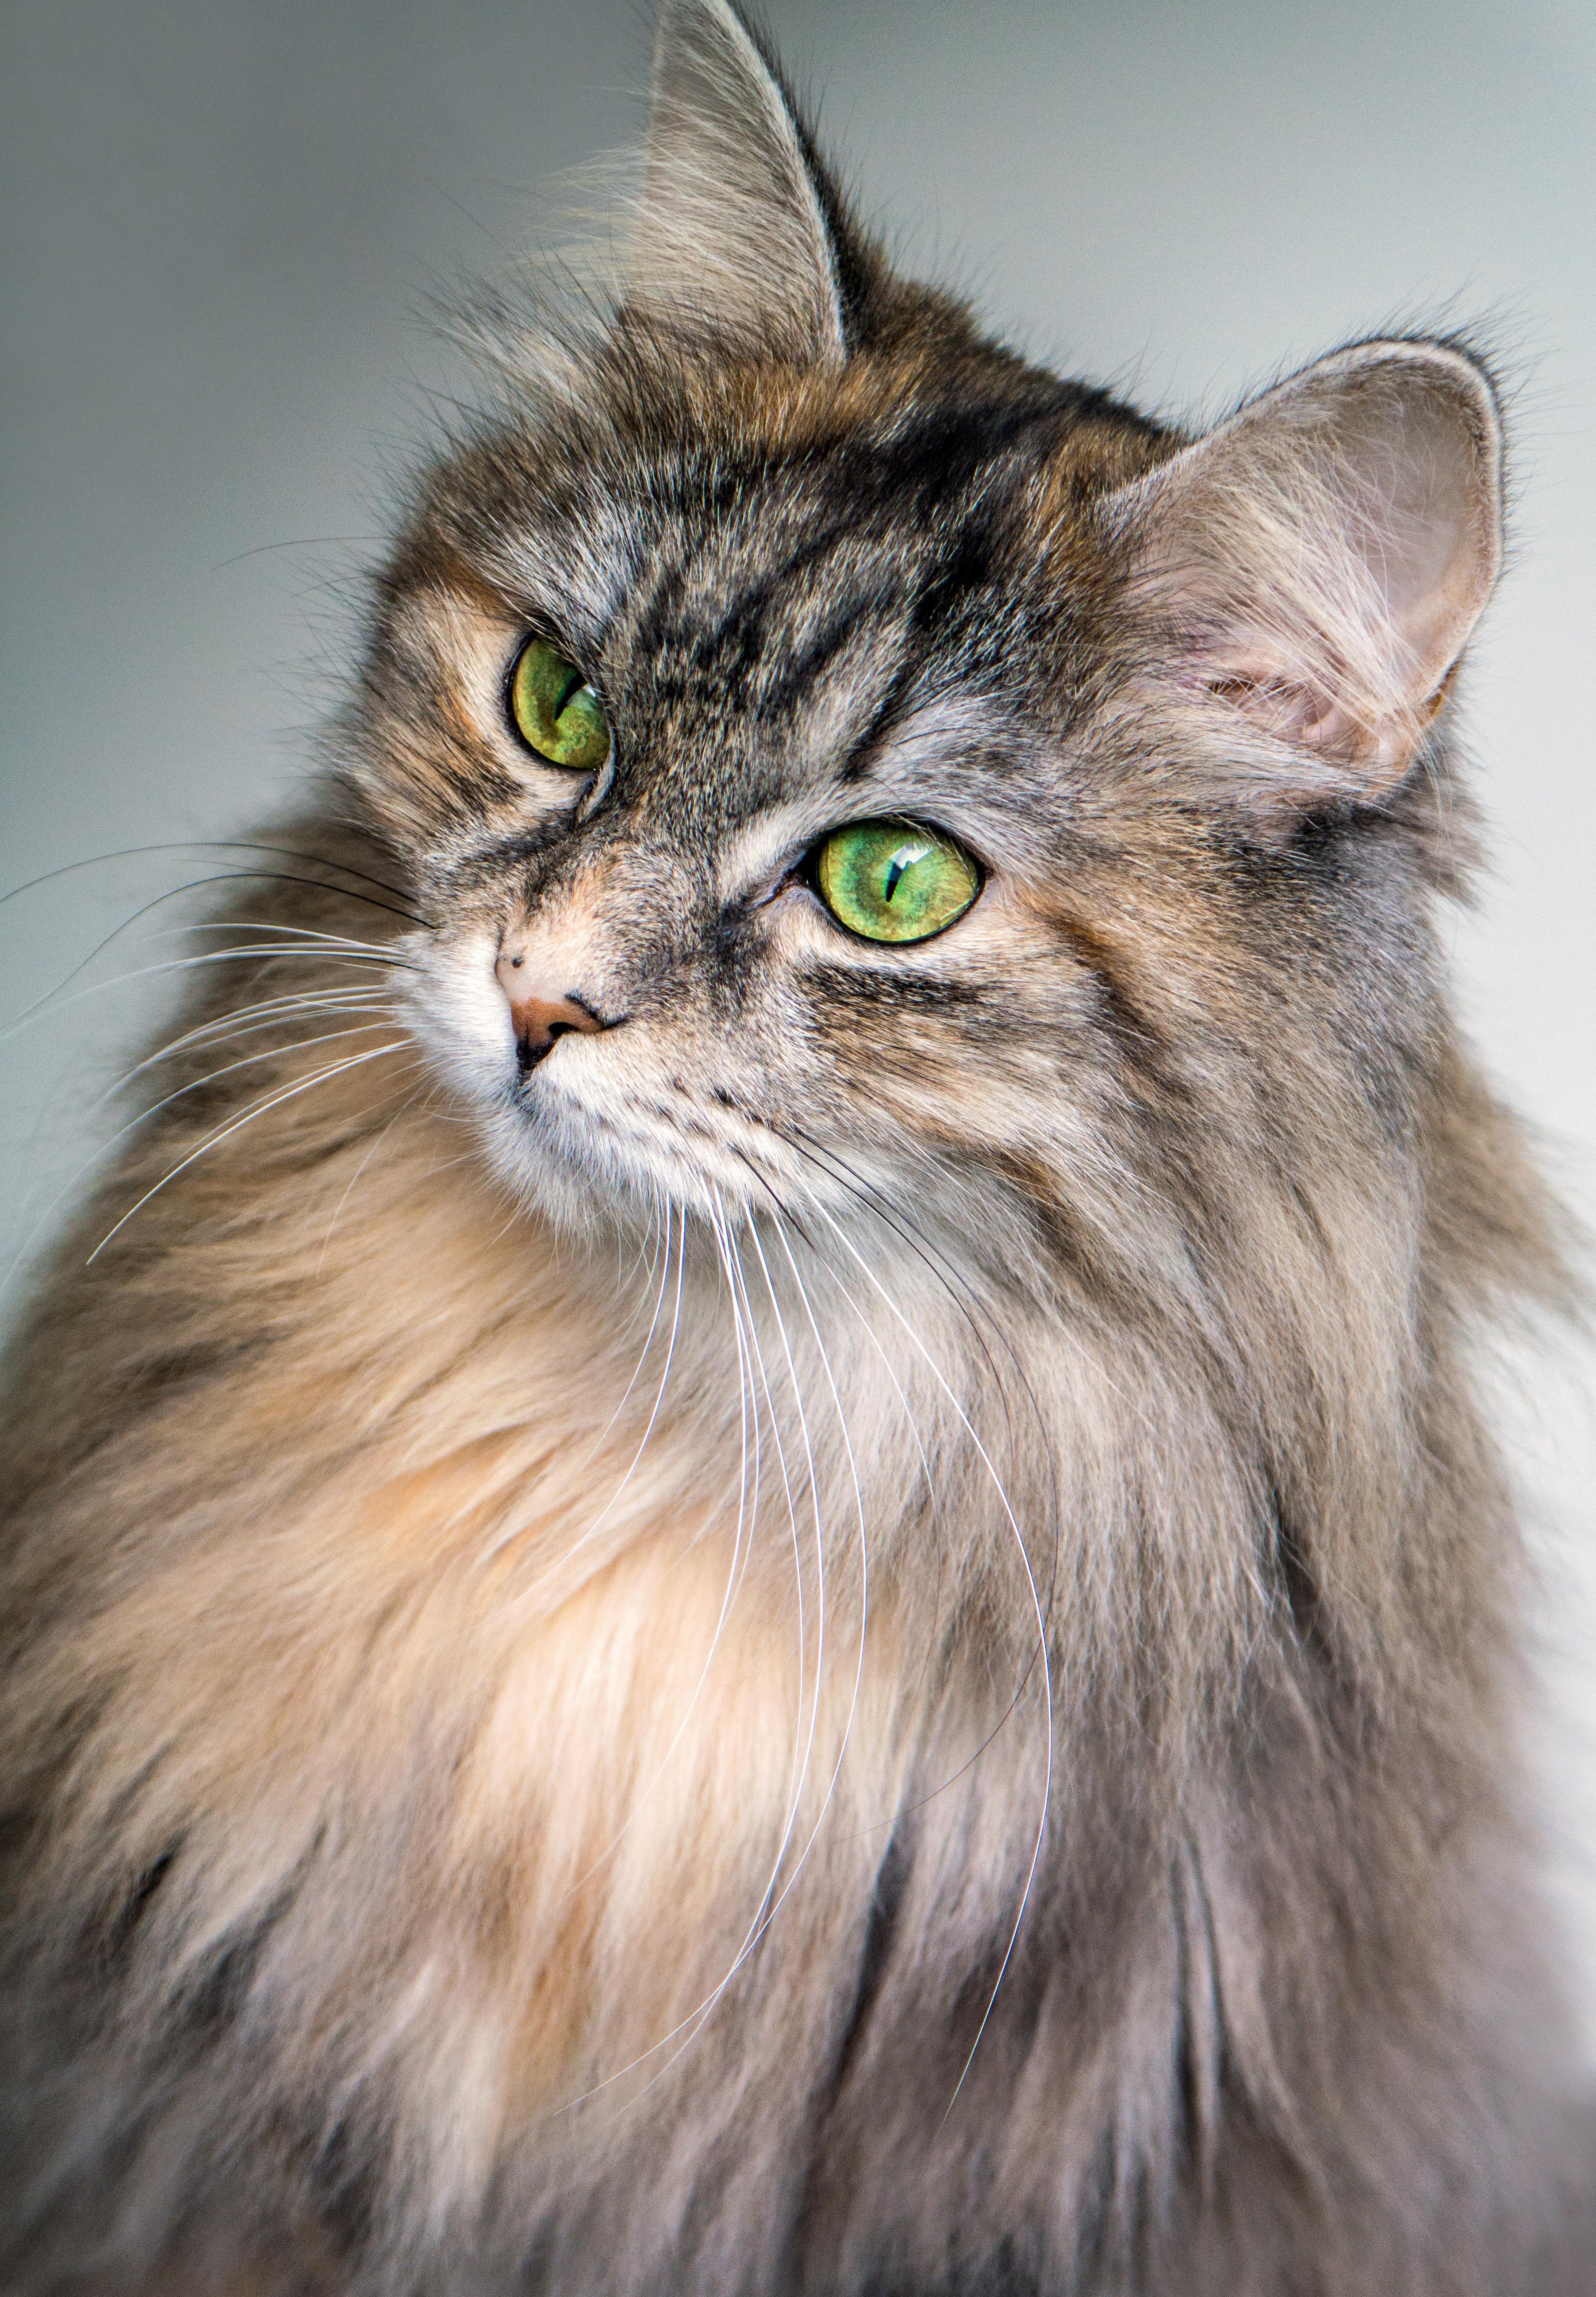 Free Images Animal Pet Whisker Fauna Whiskers Eye